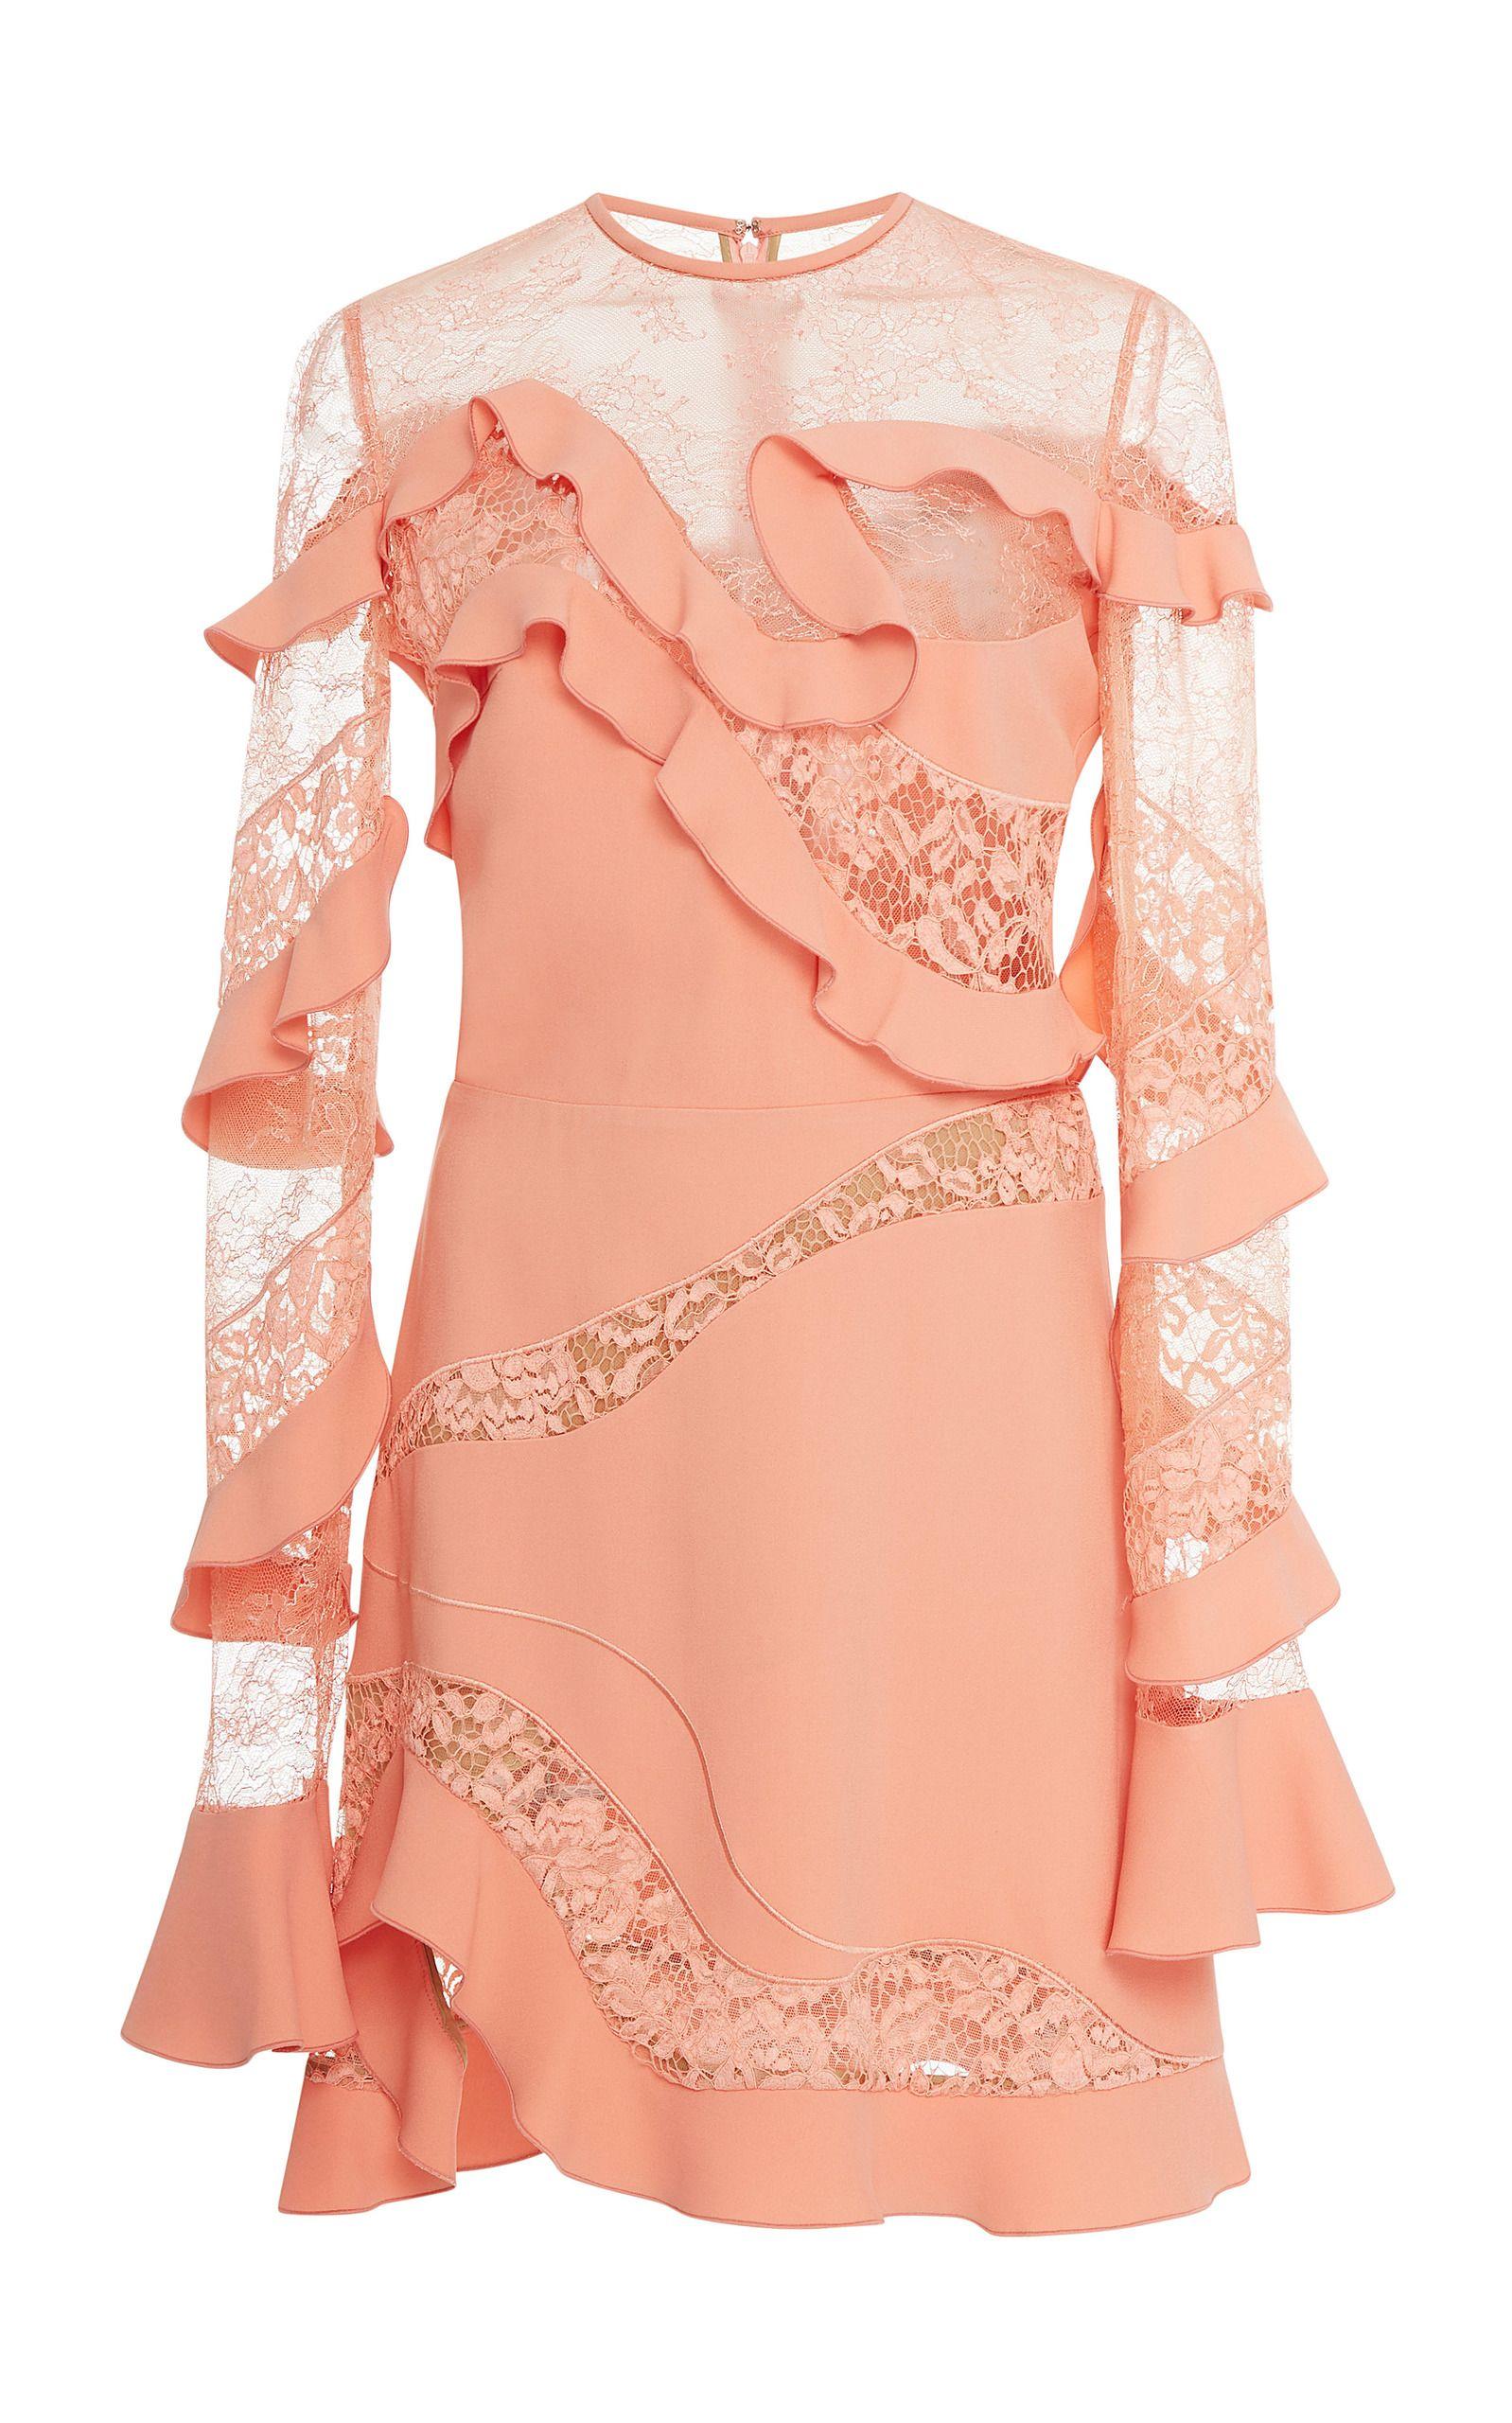 Ruffle and lace mini dress dresses pinterest dresses lace